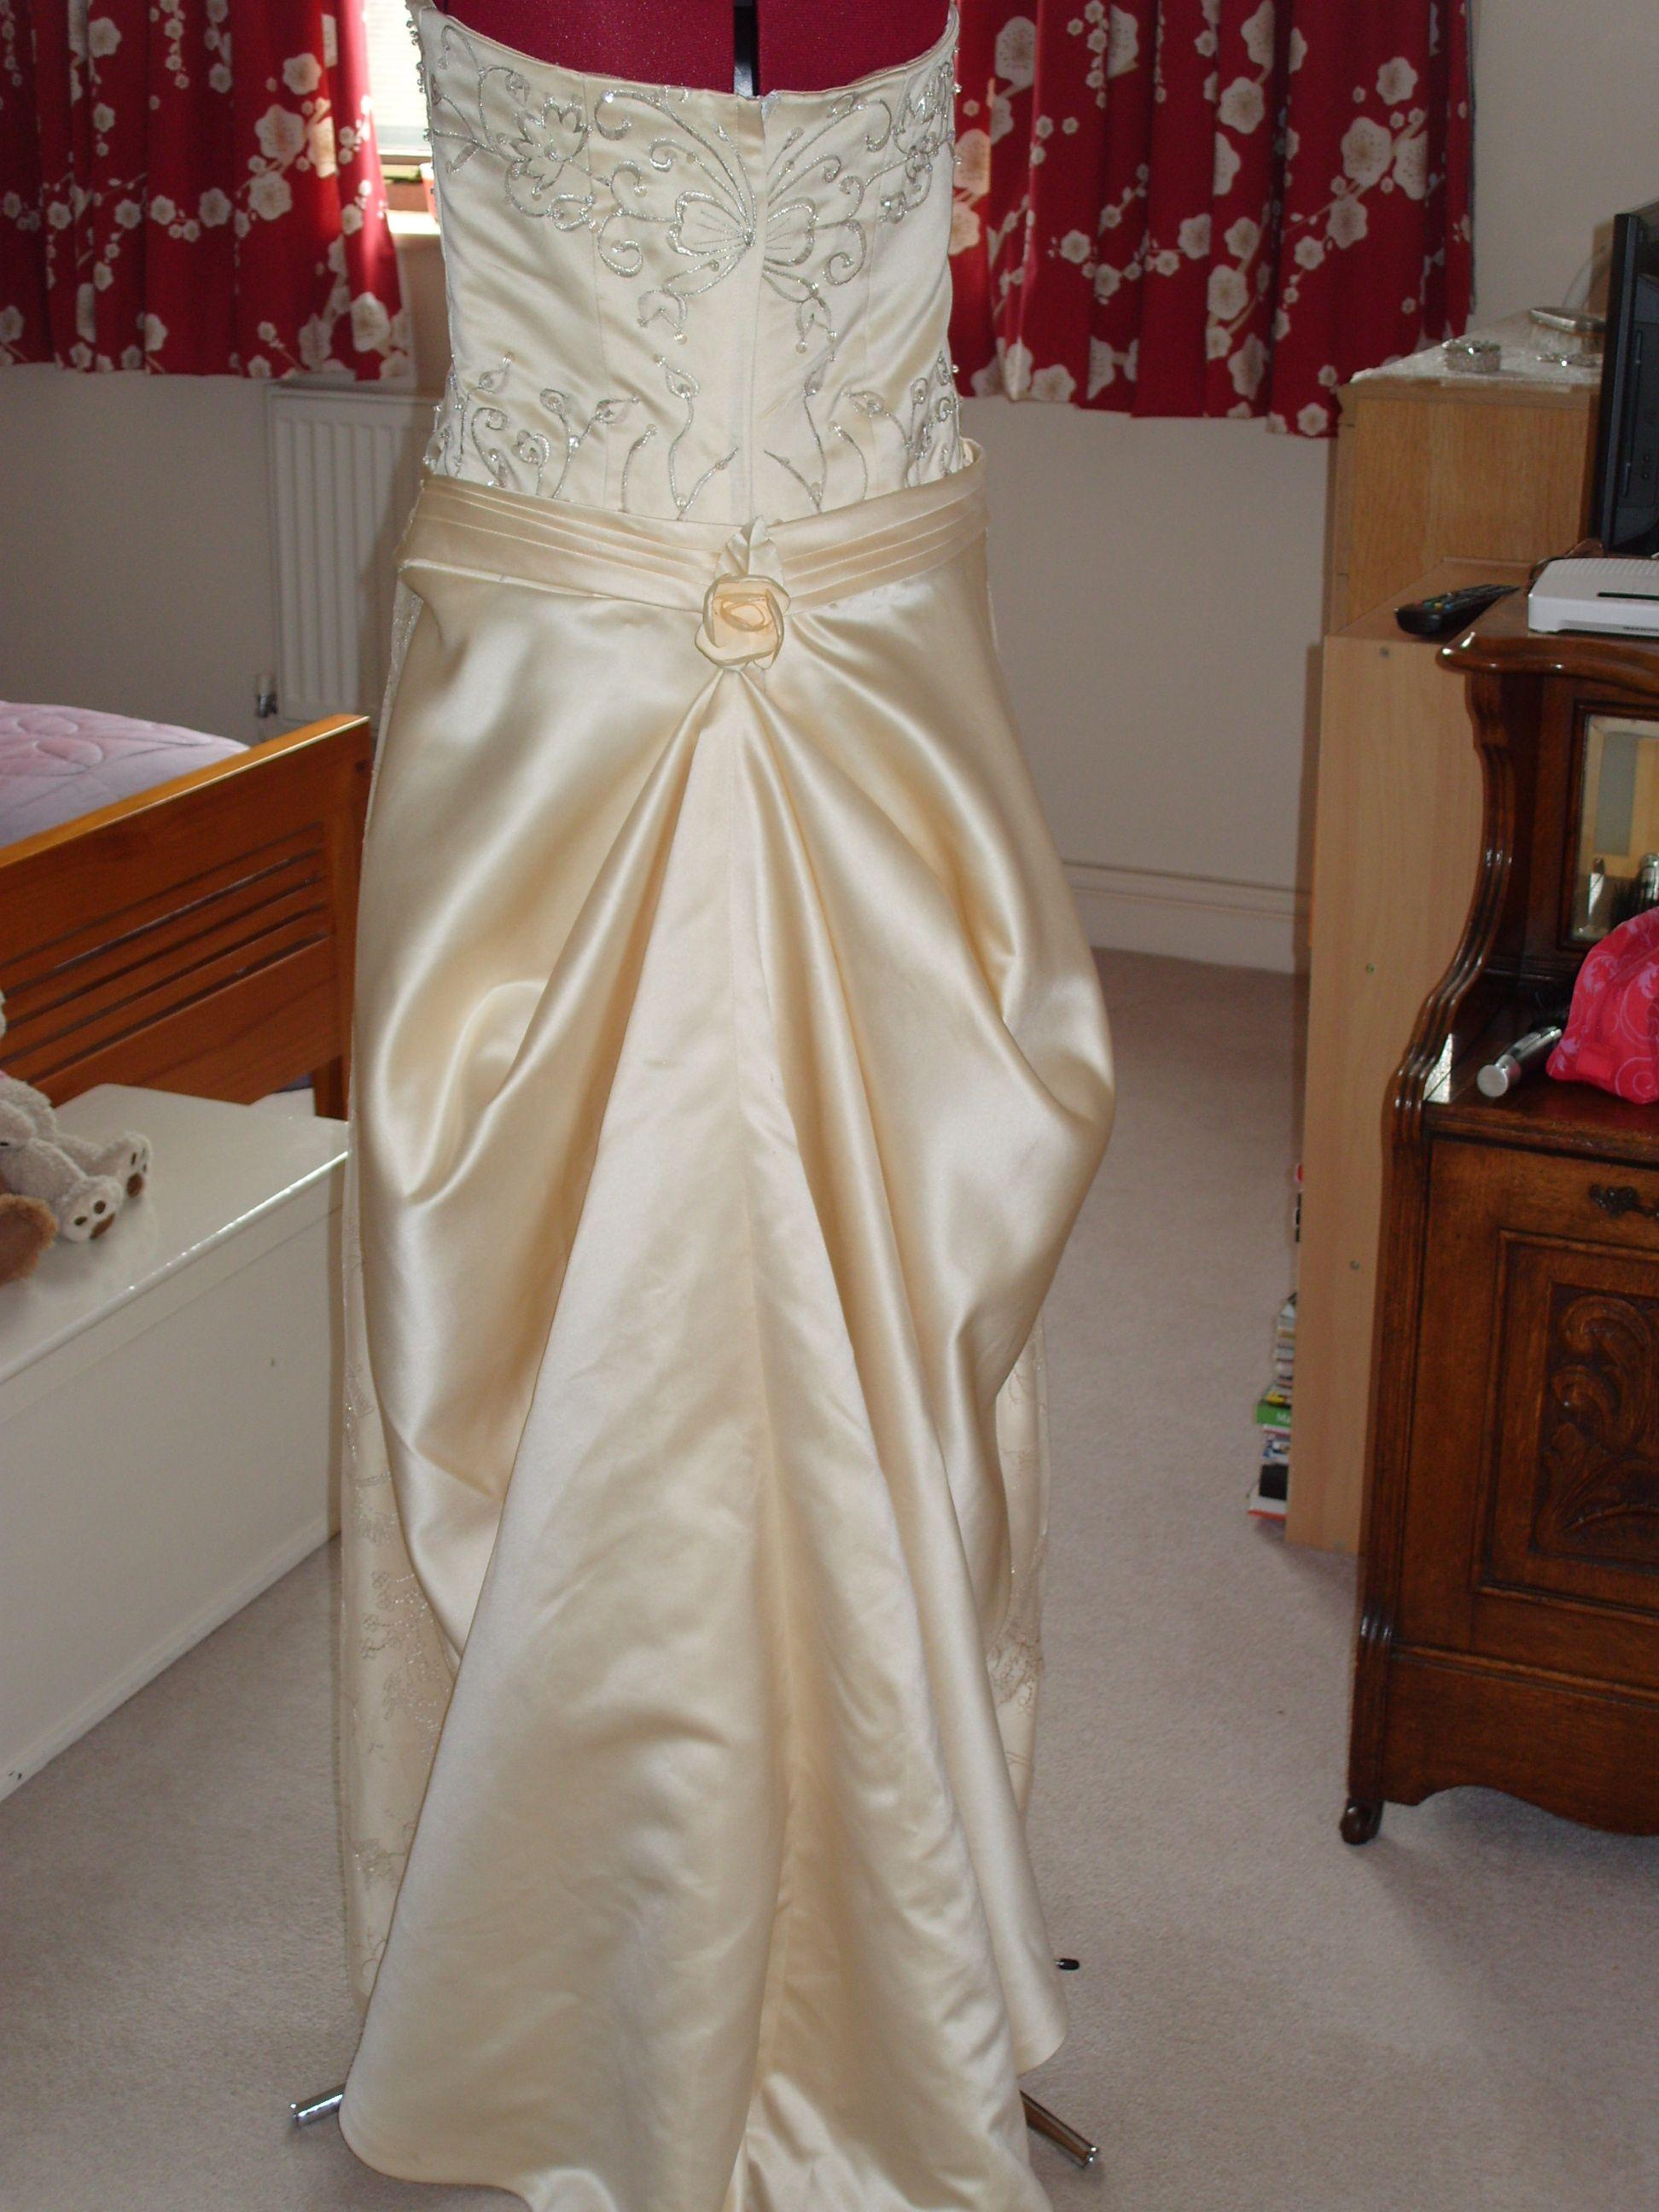 redesigned wedding dress.